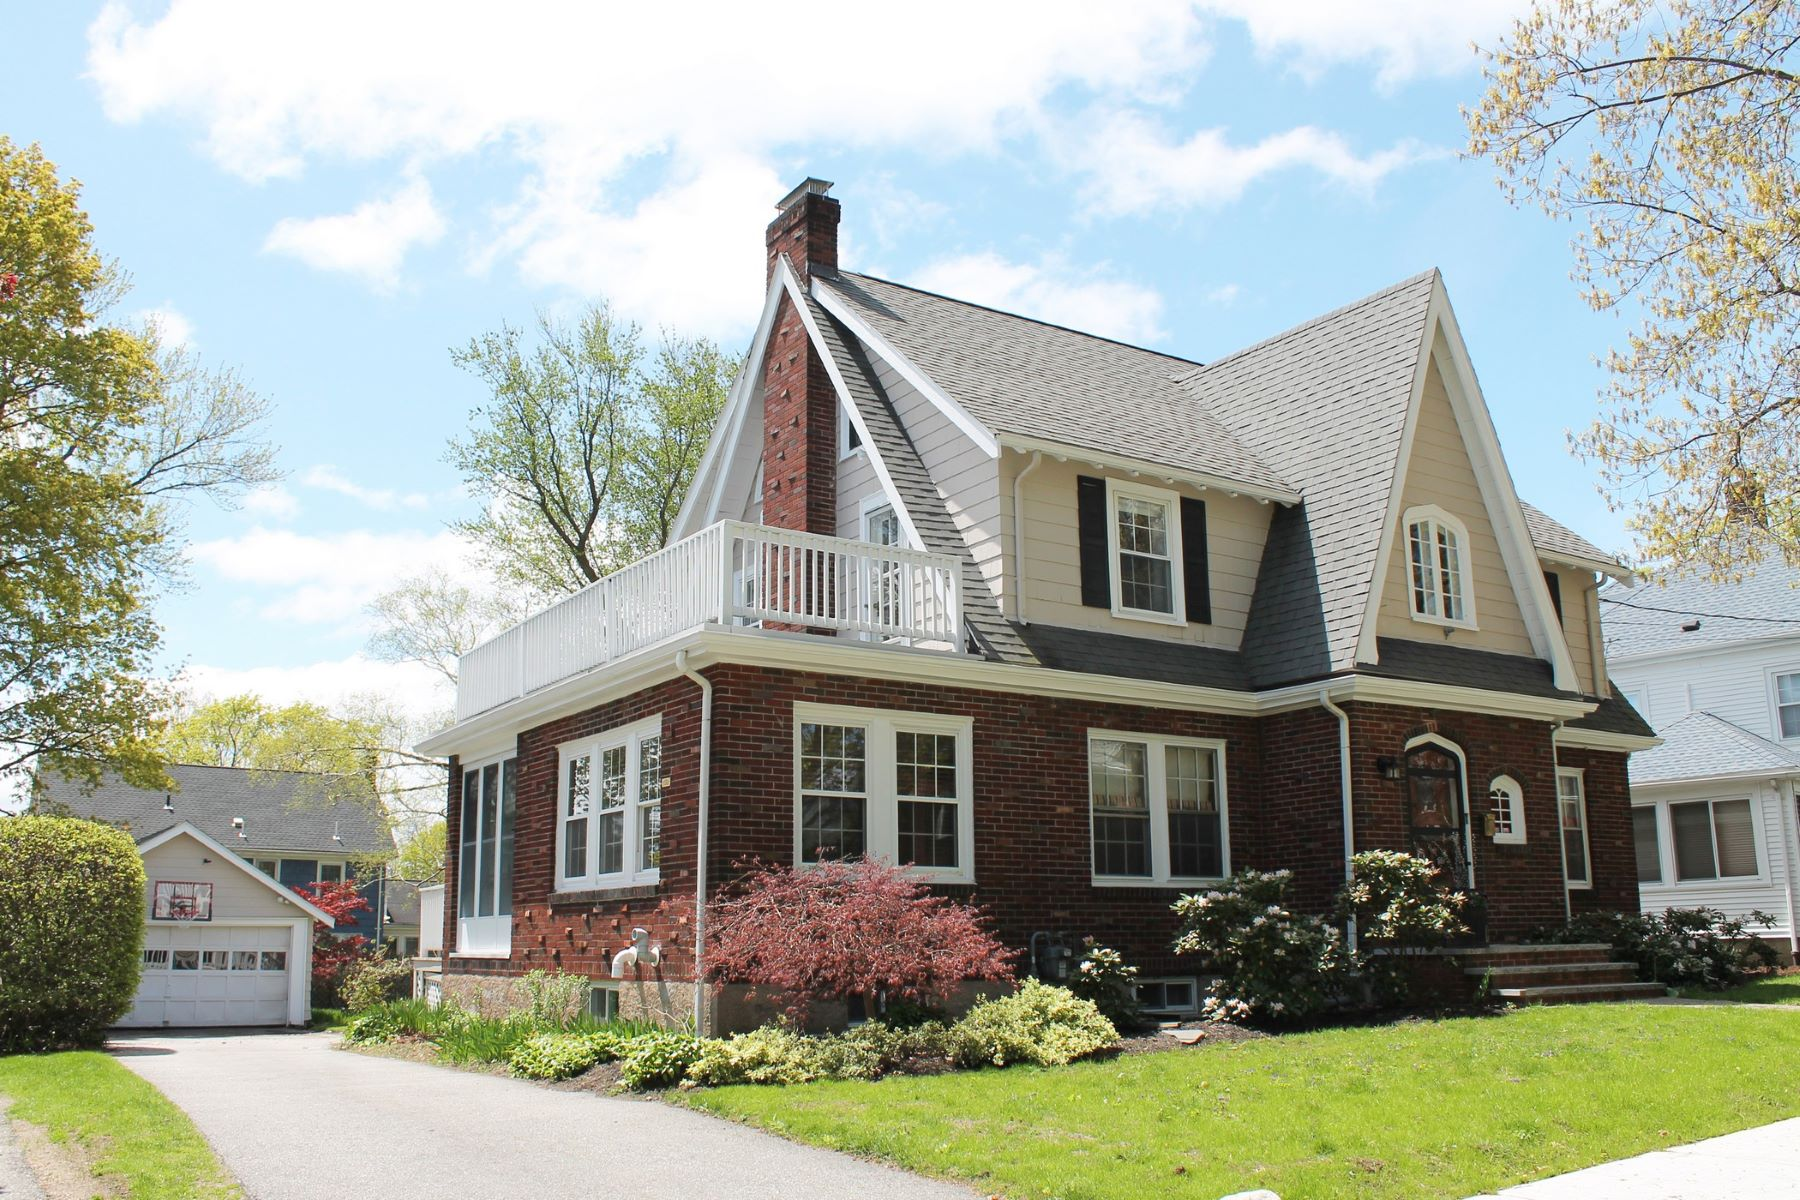 Single Family Home for Active at 26 Douglas Road, Belmont 26 Douglas Rd Belmont, Massachusetts 02478 United States